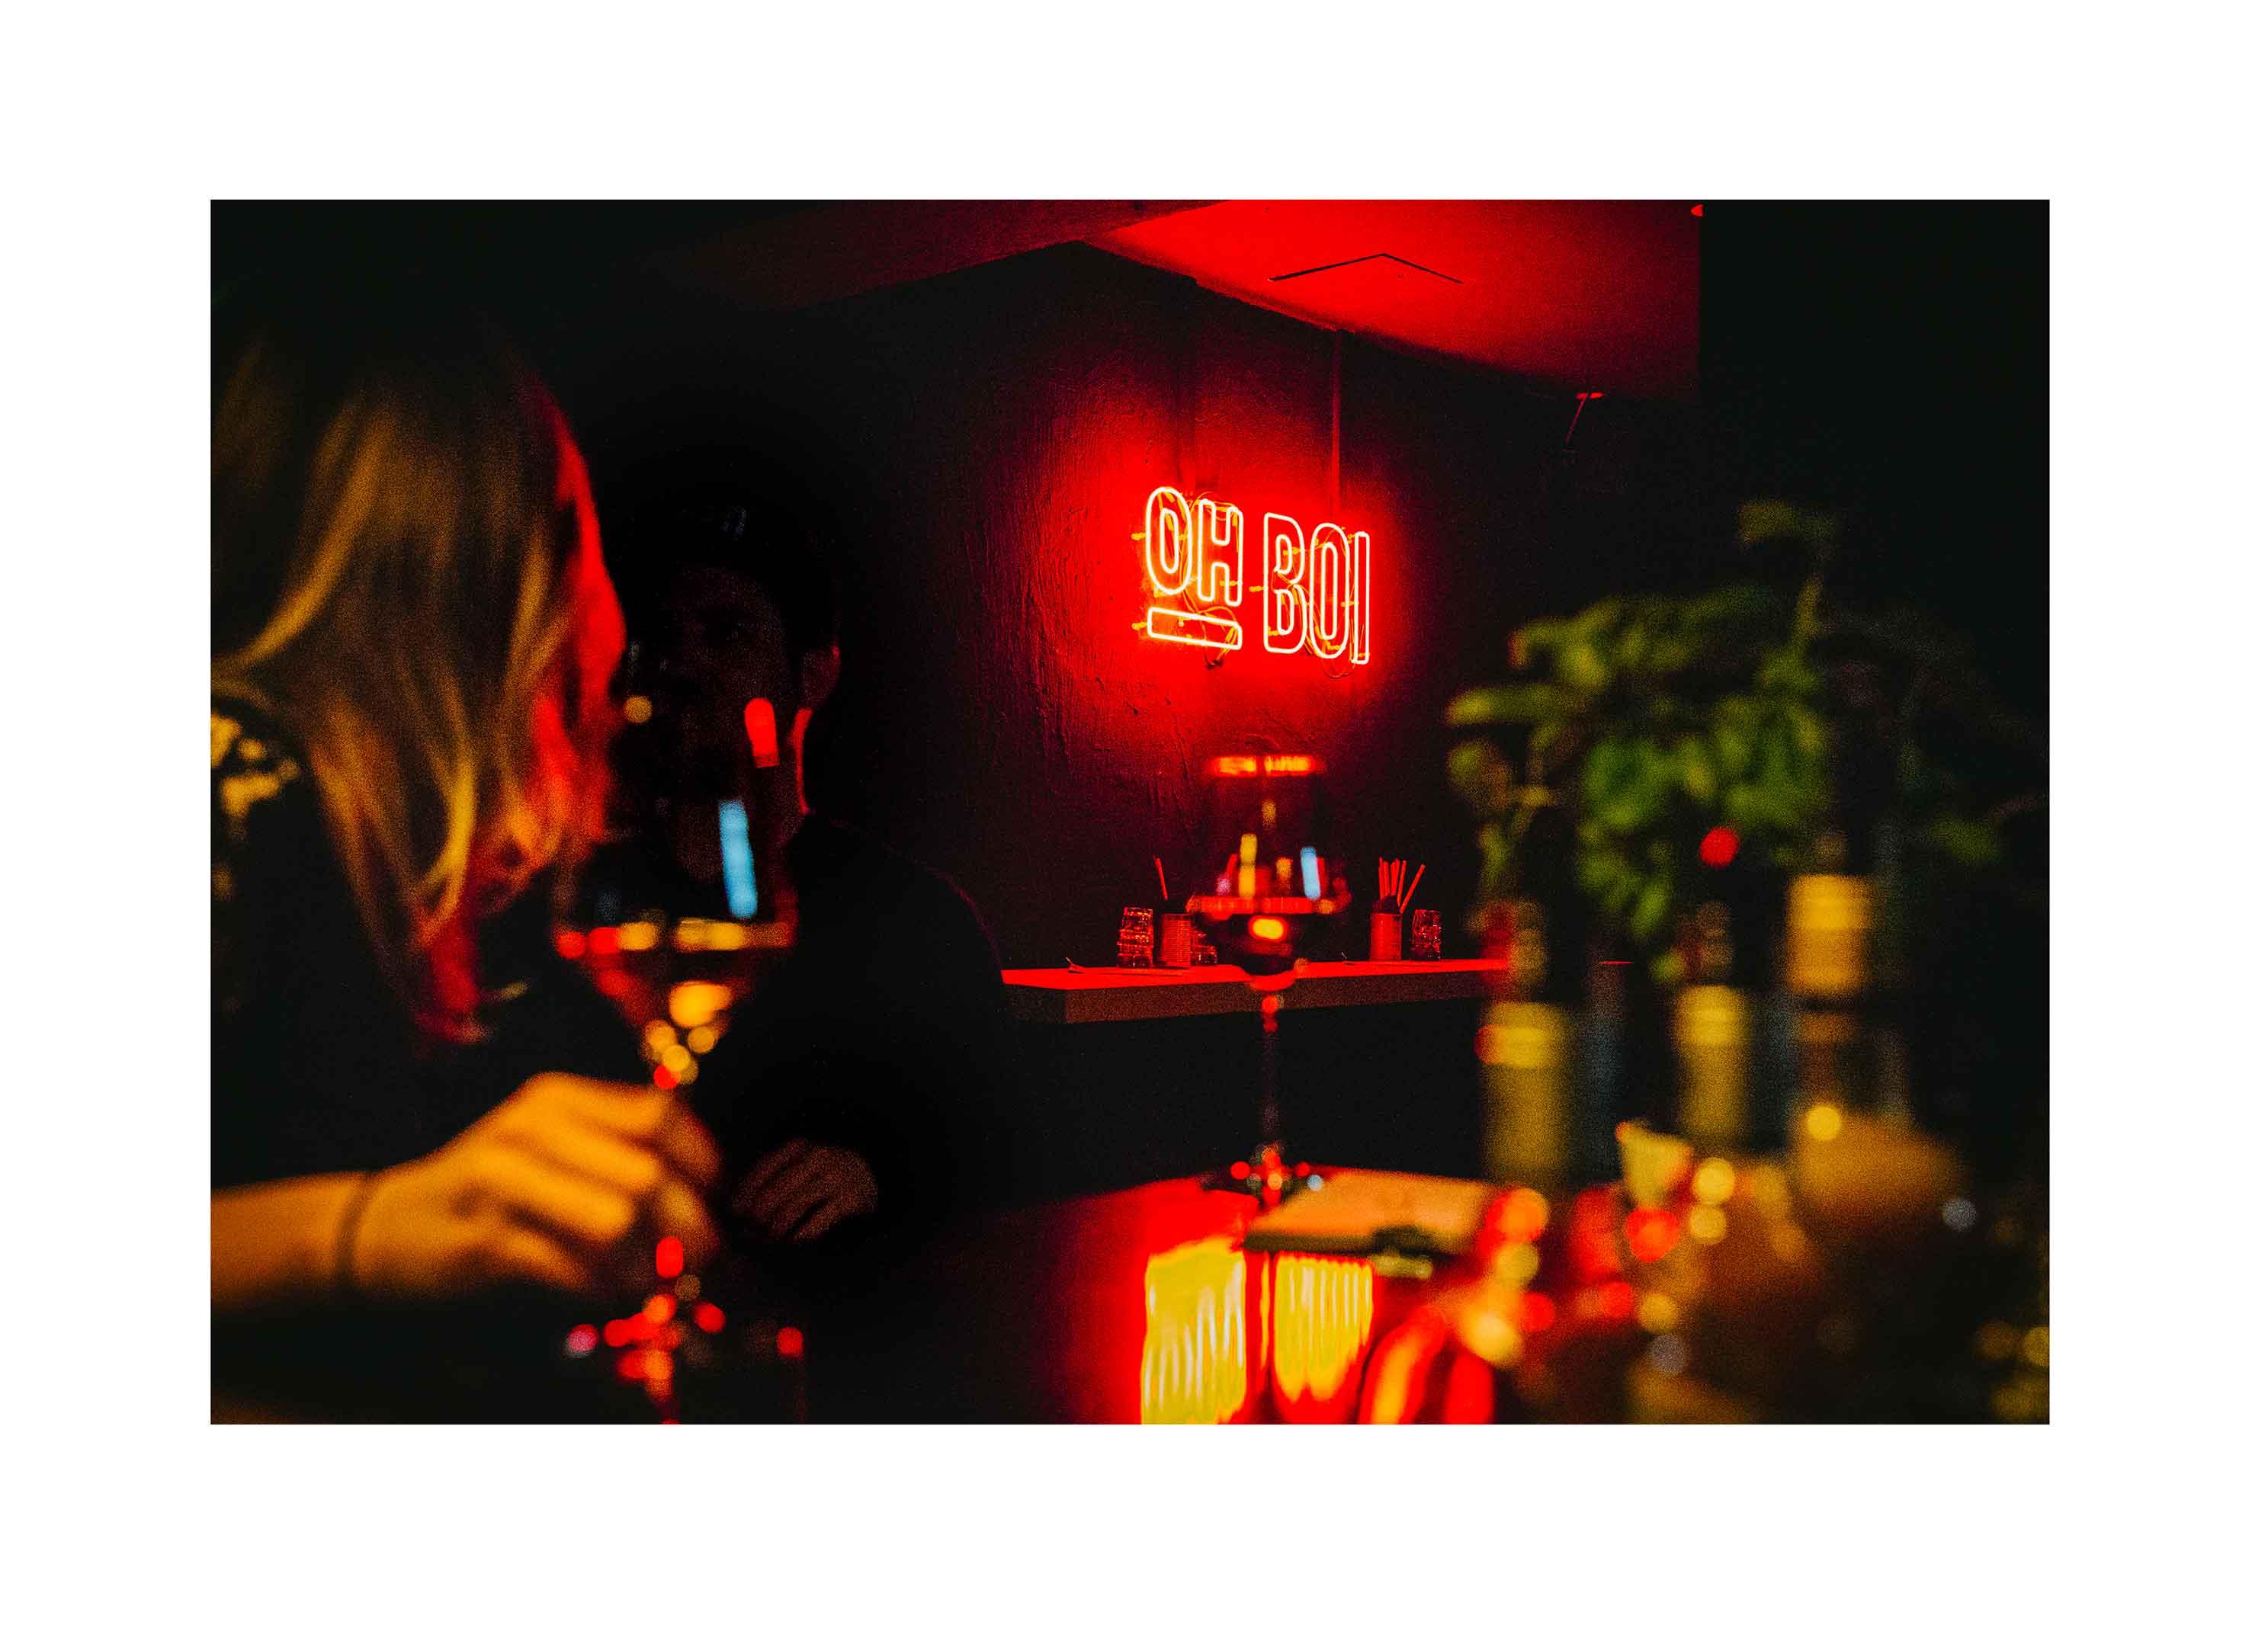 11-oh-boi-bar-food-augsburg-branding-design-neon-schriftzug